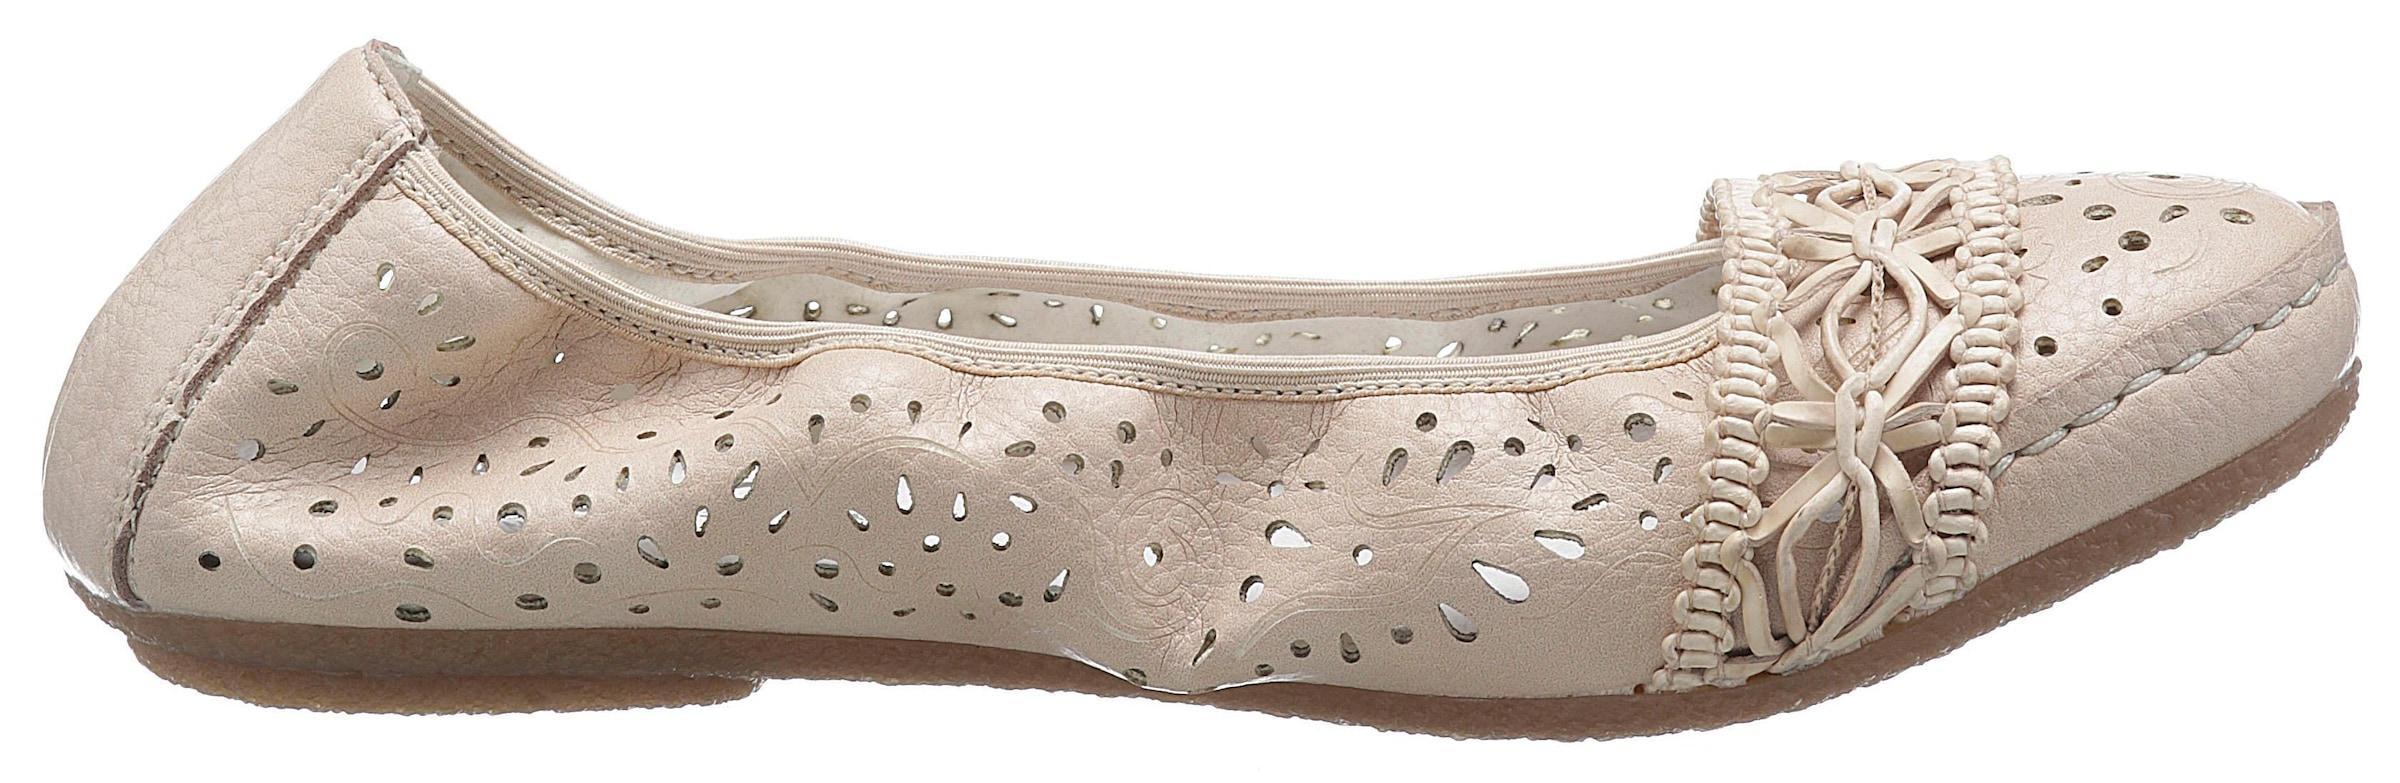 Details zu Ballerina Rieker Damenmode Ballerinas Damen Schuhe Gepolsterte Lederinnensohle